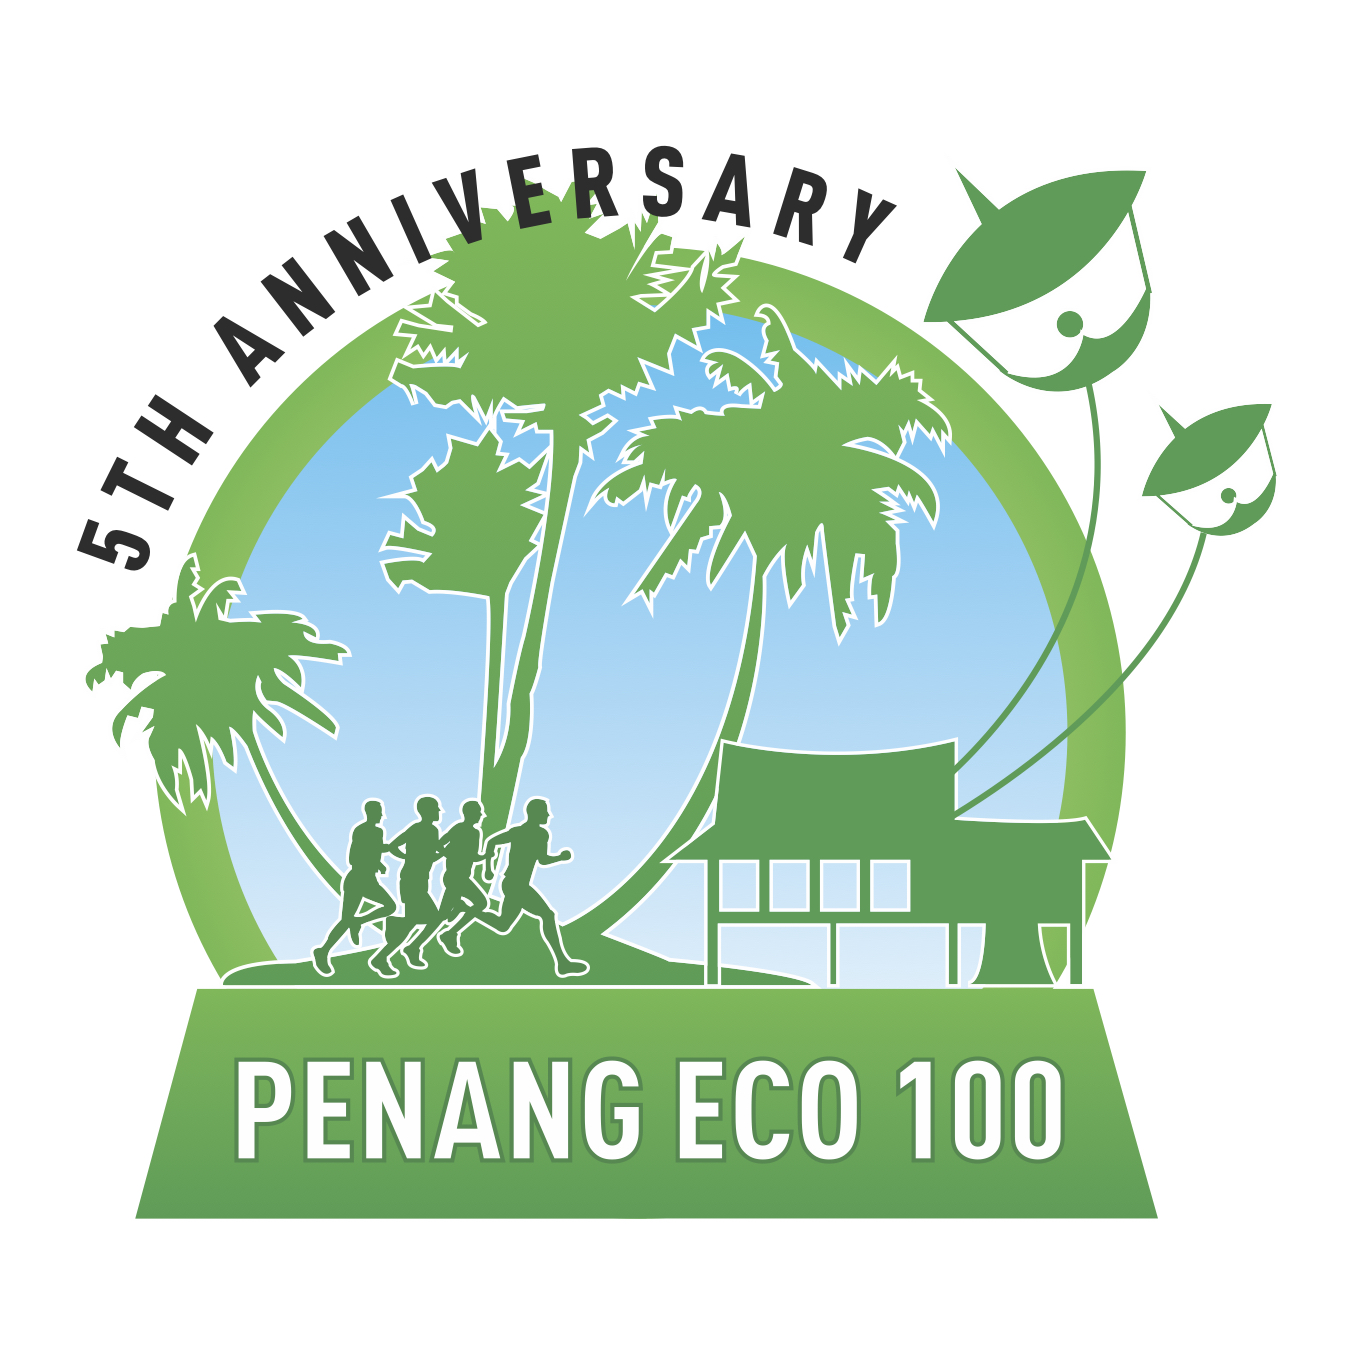 Penang Eco 100 new logo.jpg